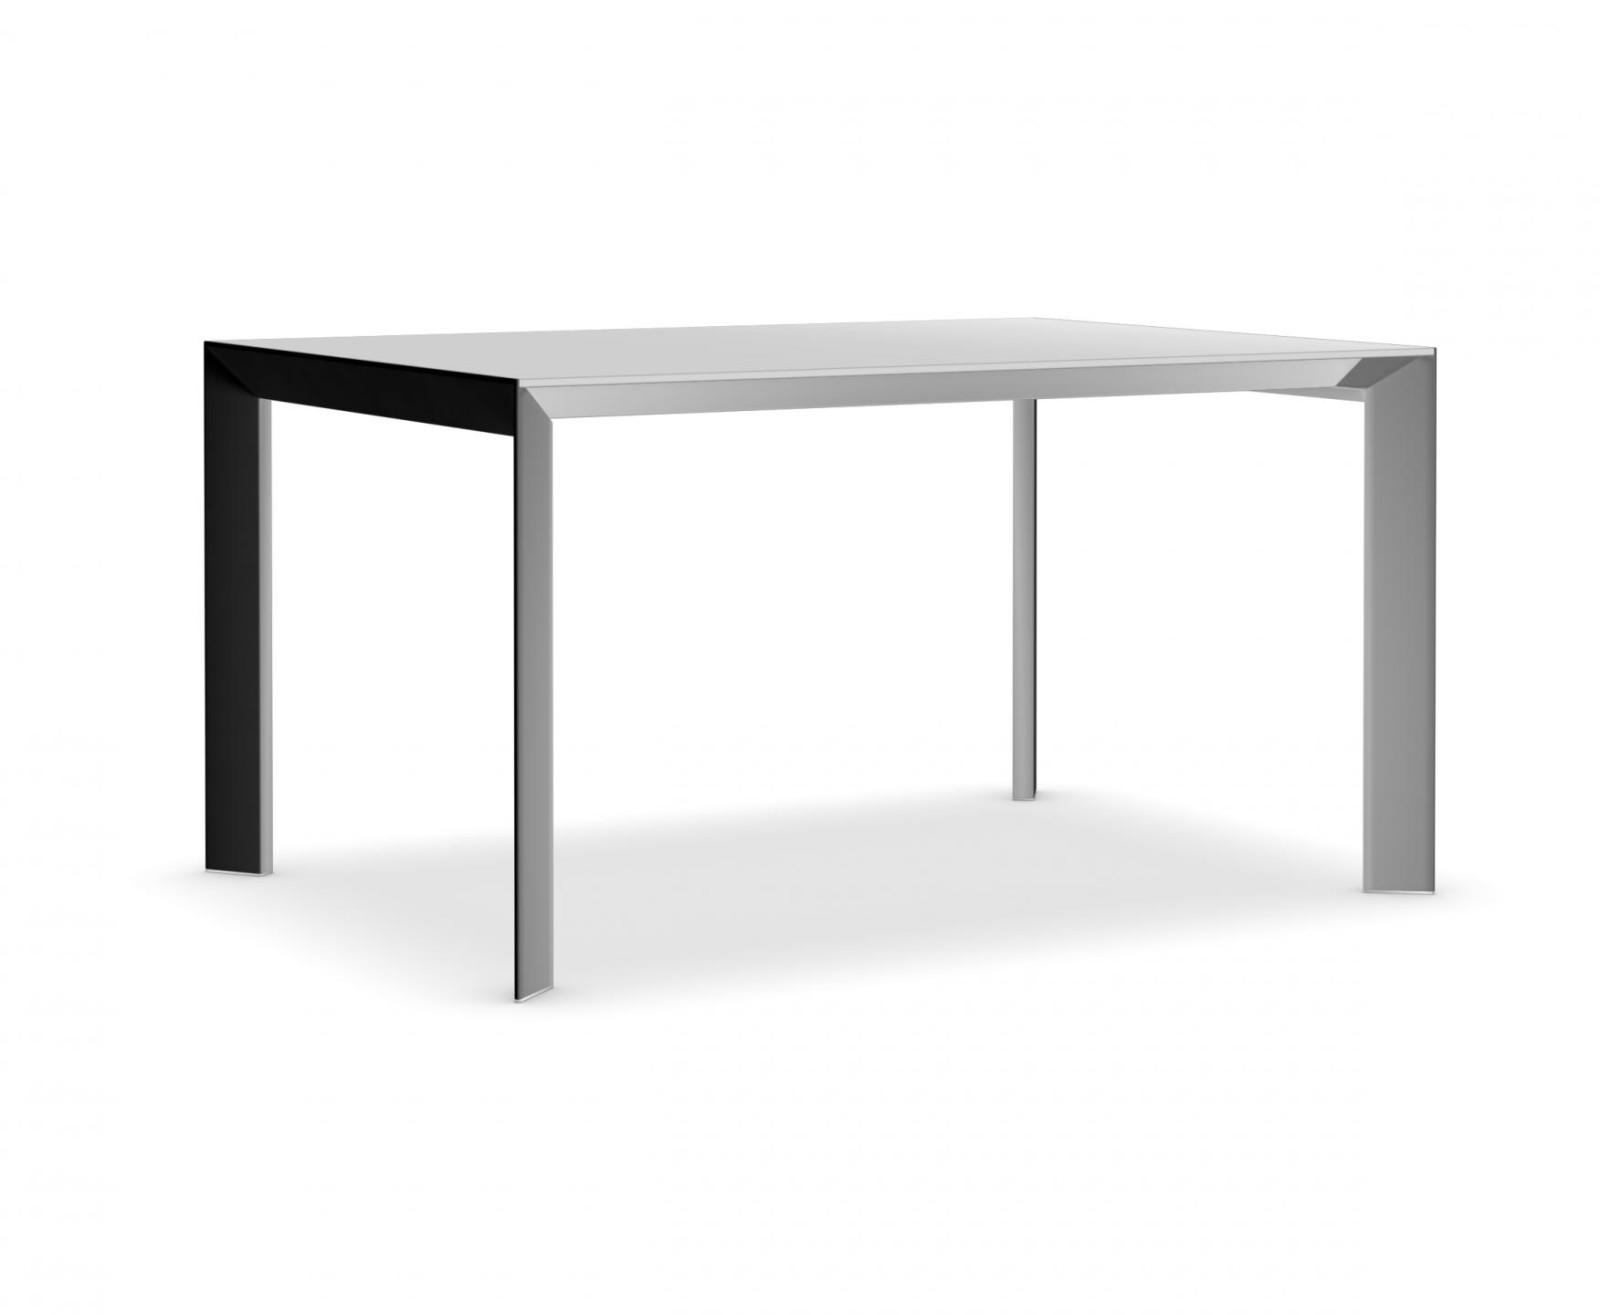 Nori glass Fixed - Depth 100 cm 166 cm, Anodised Aluminium, Gloss glass: Extra White